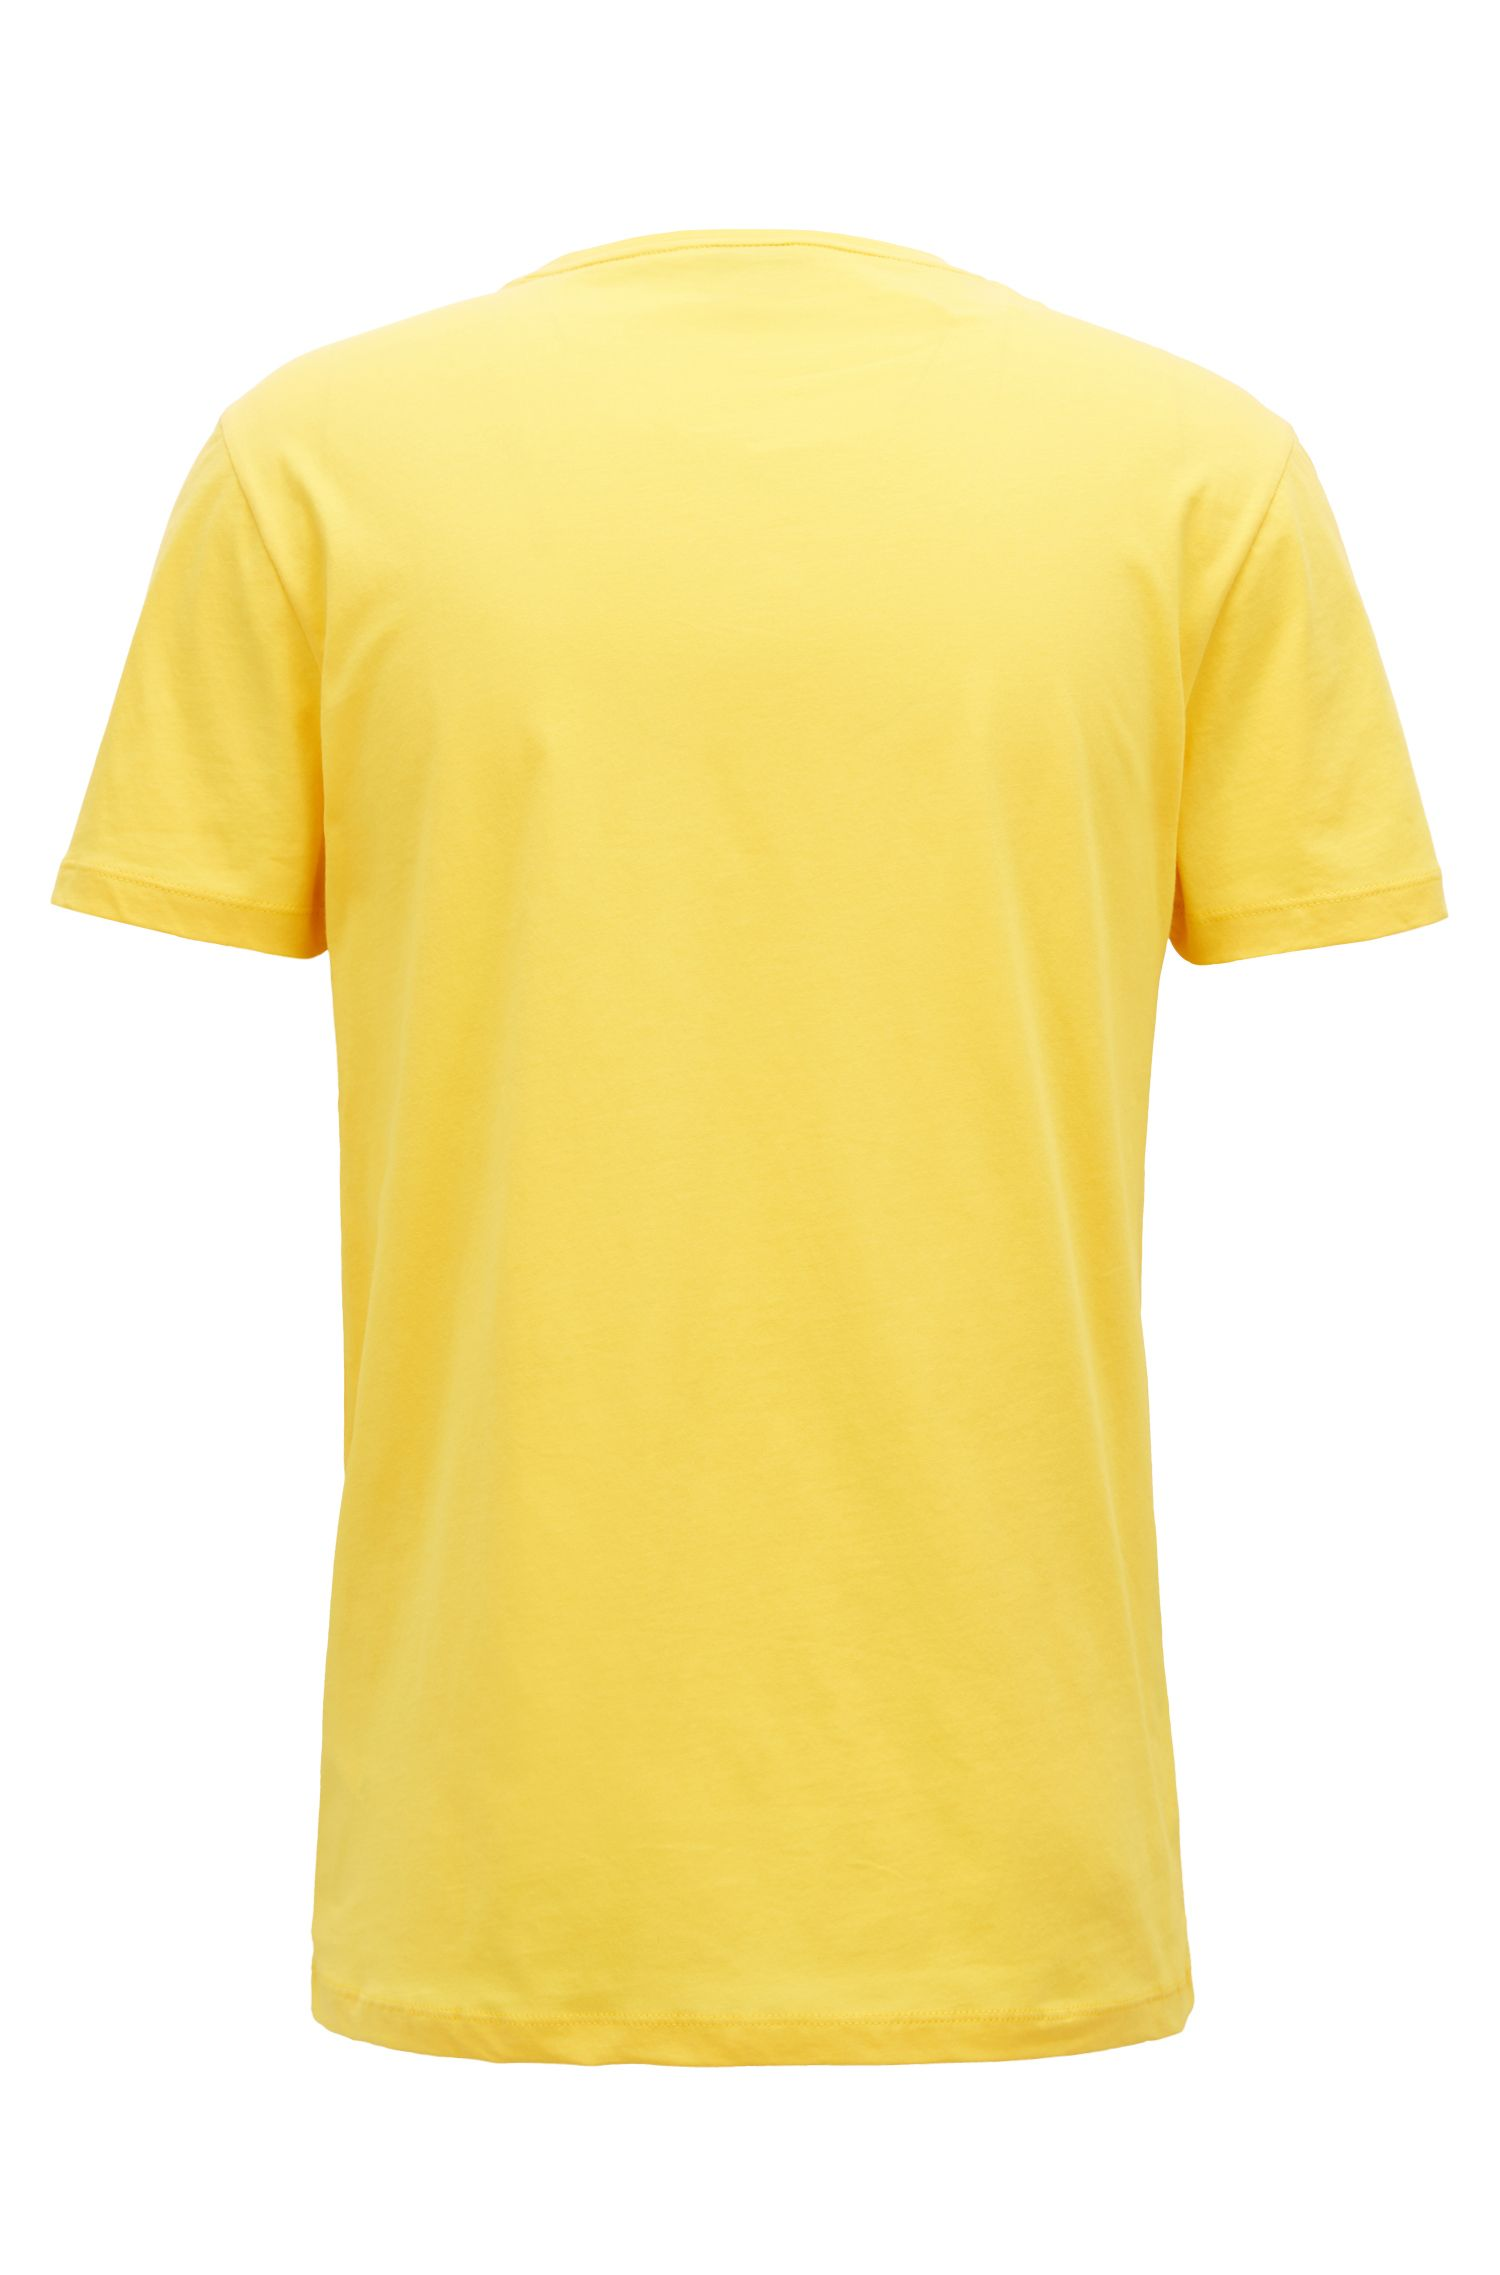 T-shirt en jersey avec logo floqué en dégradé